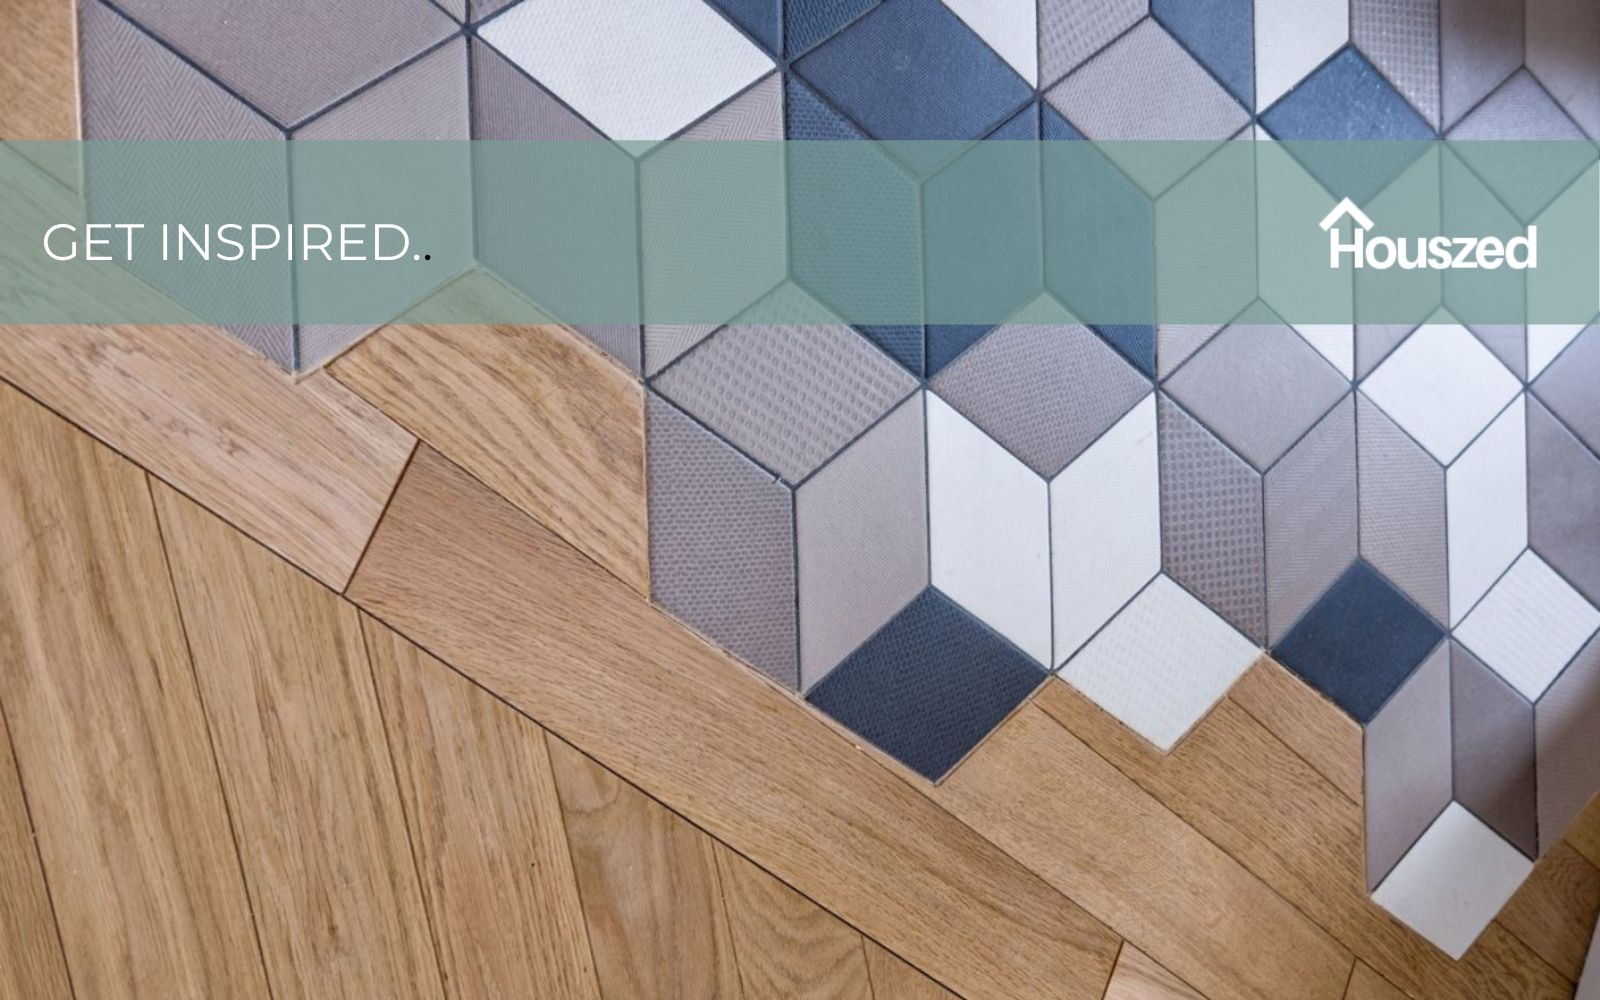 25 Stylish Floor Transition Ideas That Catch The Eye In 2020 Houszed